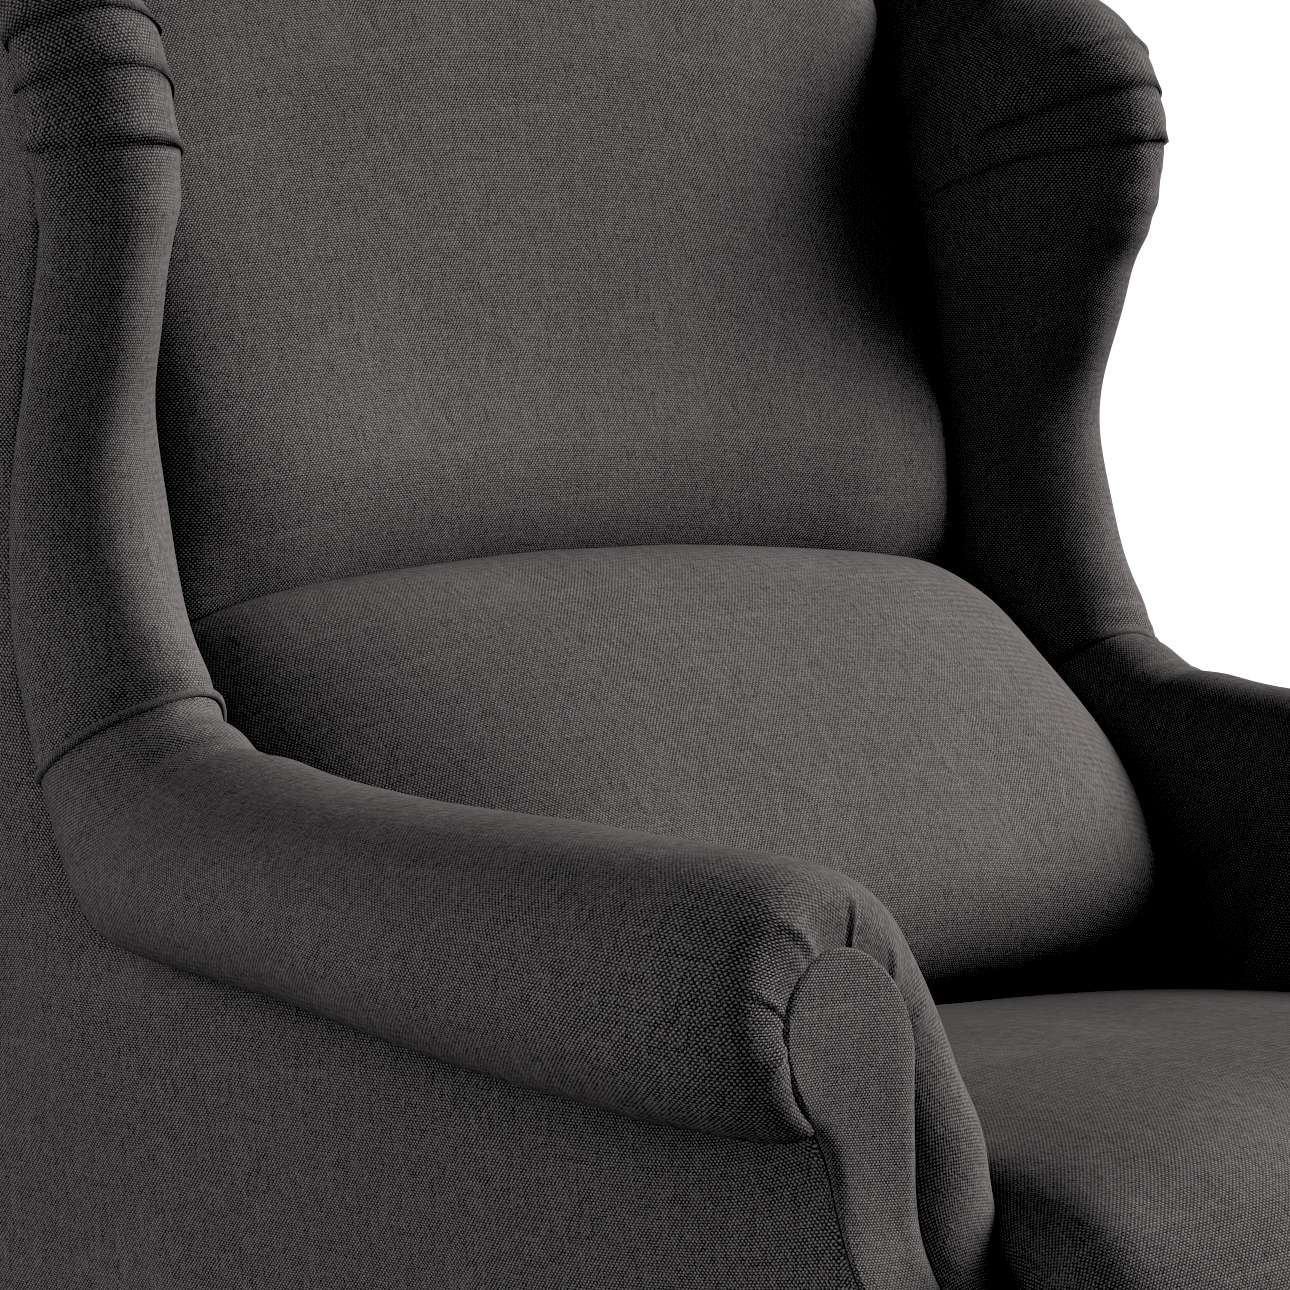 Stilingas Dekoria fotelis 63 x 115 cm kolekcijoje Etna , audinys: 705-35